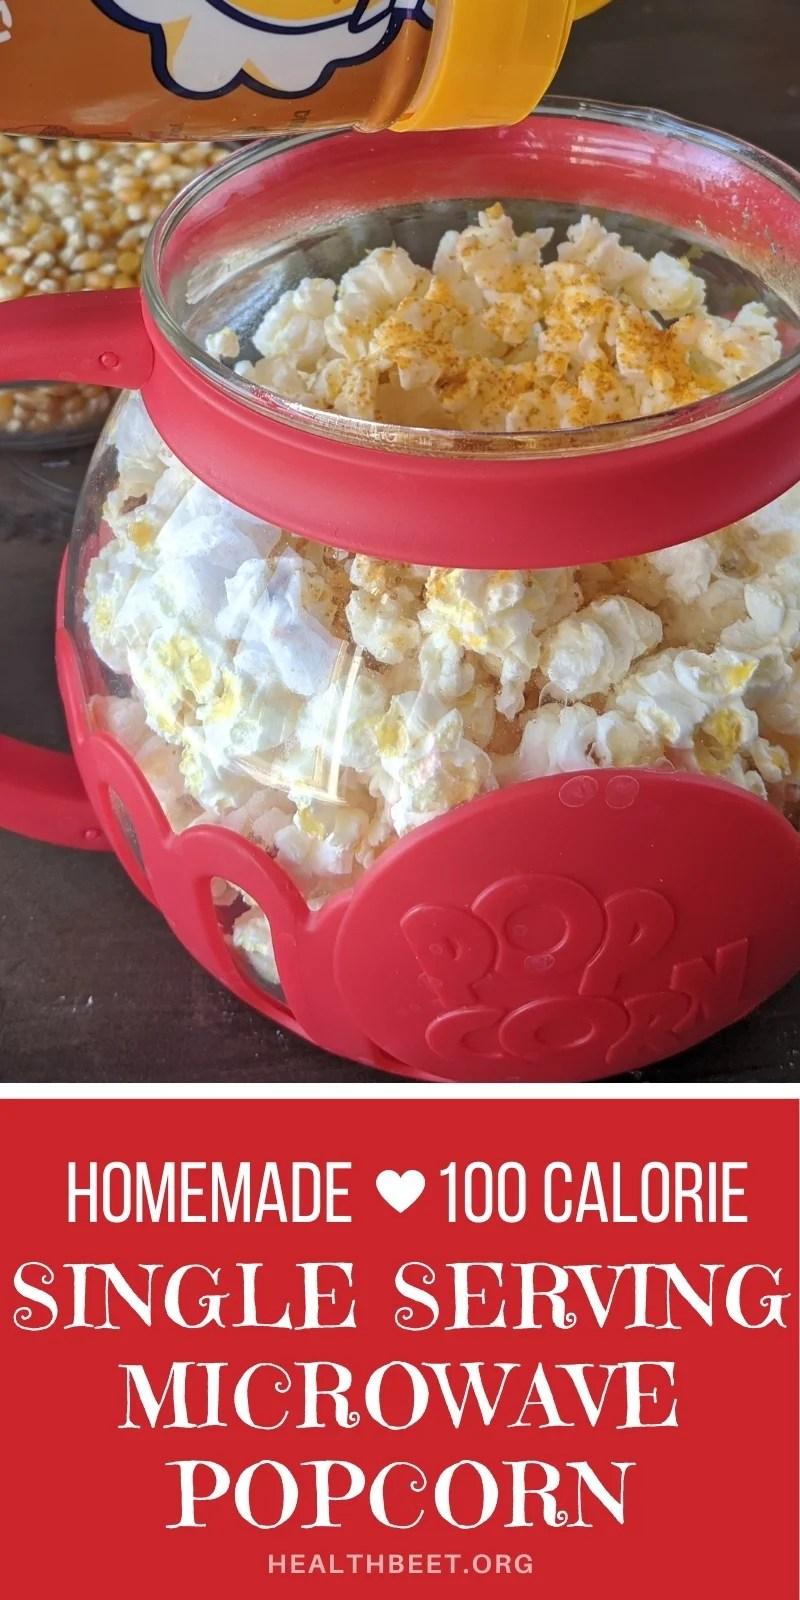 homemade 100 calorie microwave popcorn